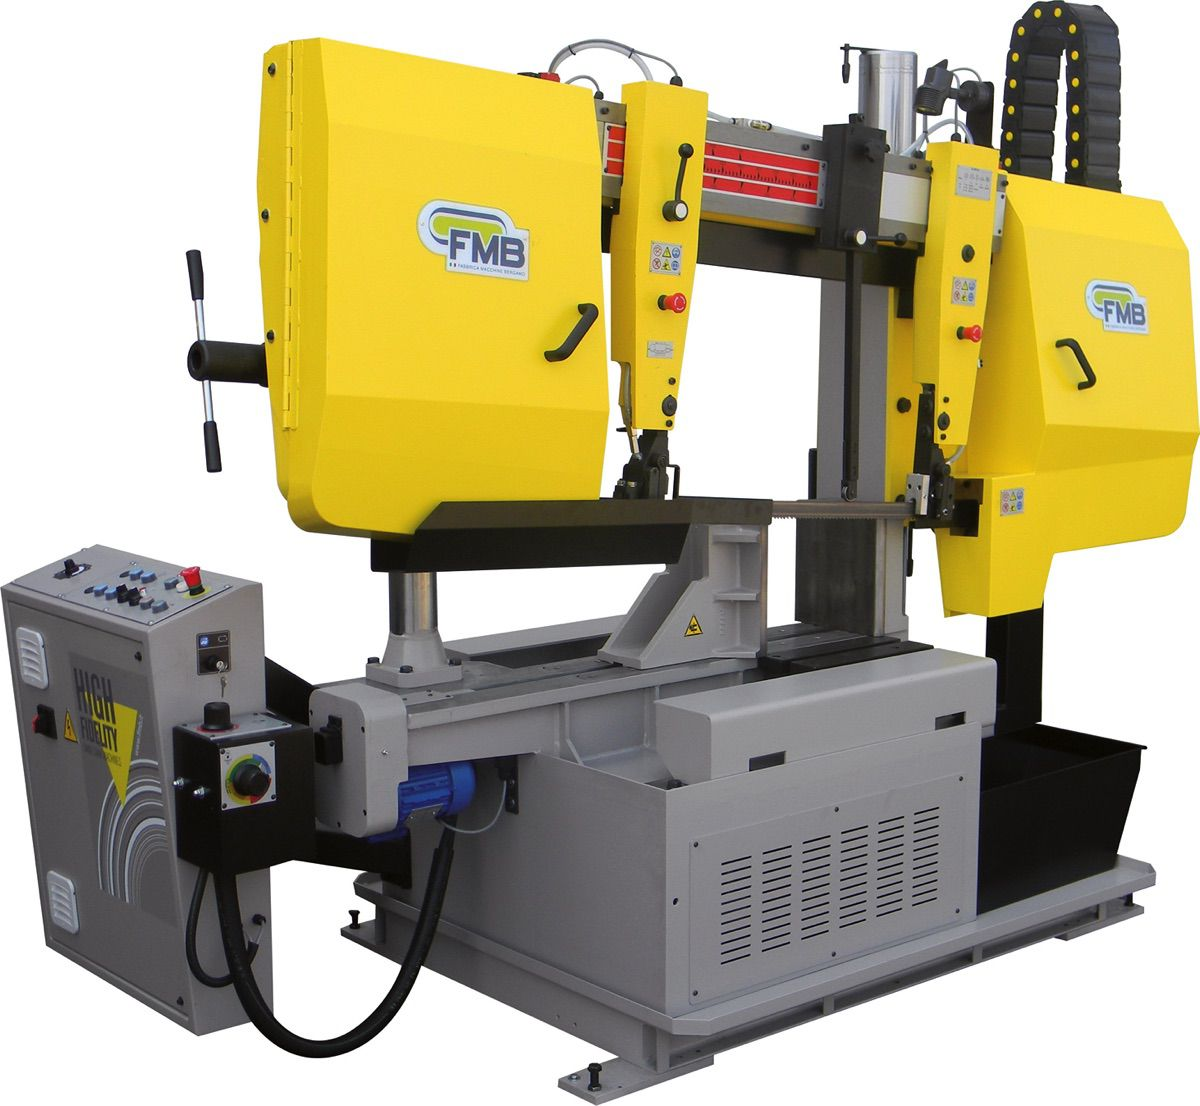 fmb olimpus 2 halfautomatische lintzaagmachine